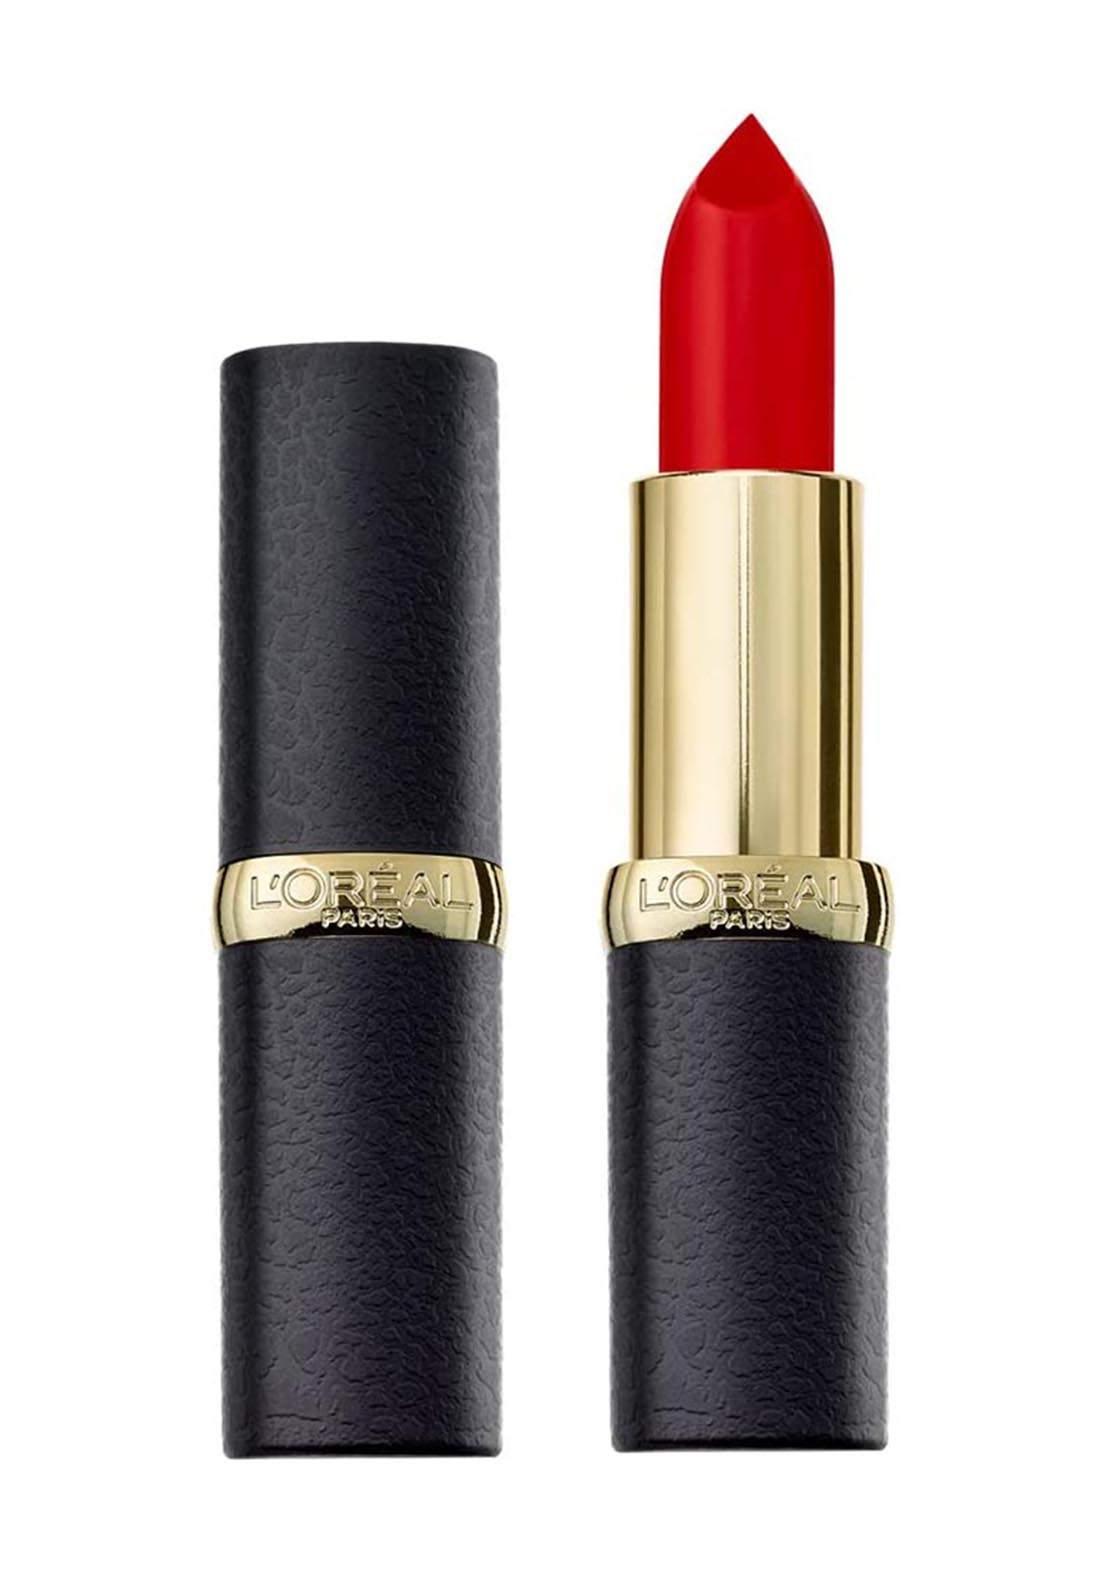 L'Oreal Paris Color Riche Matte Lipstick 346 Scarlet Silhouette (027-0855) احمر شفاه